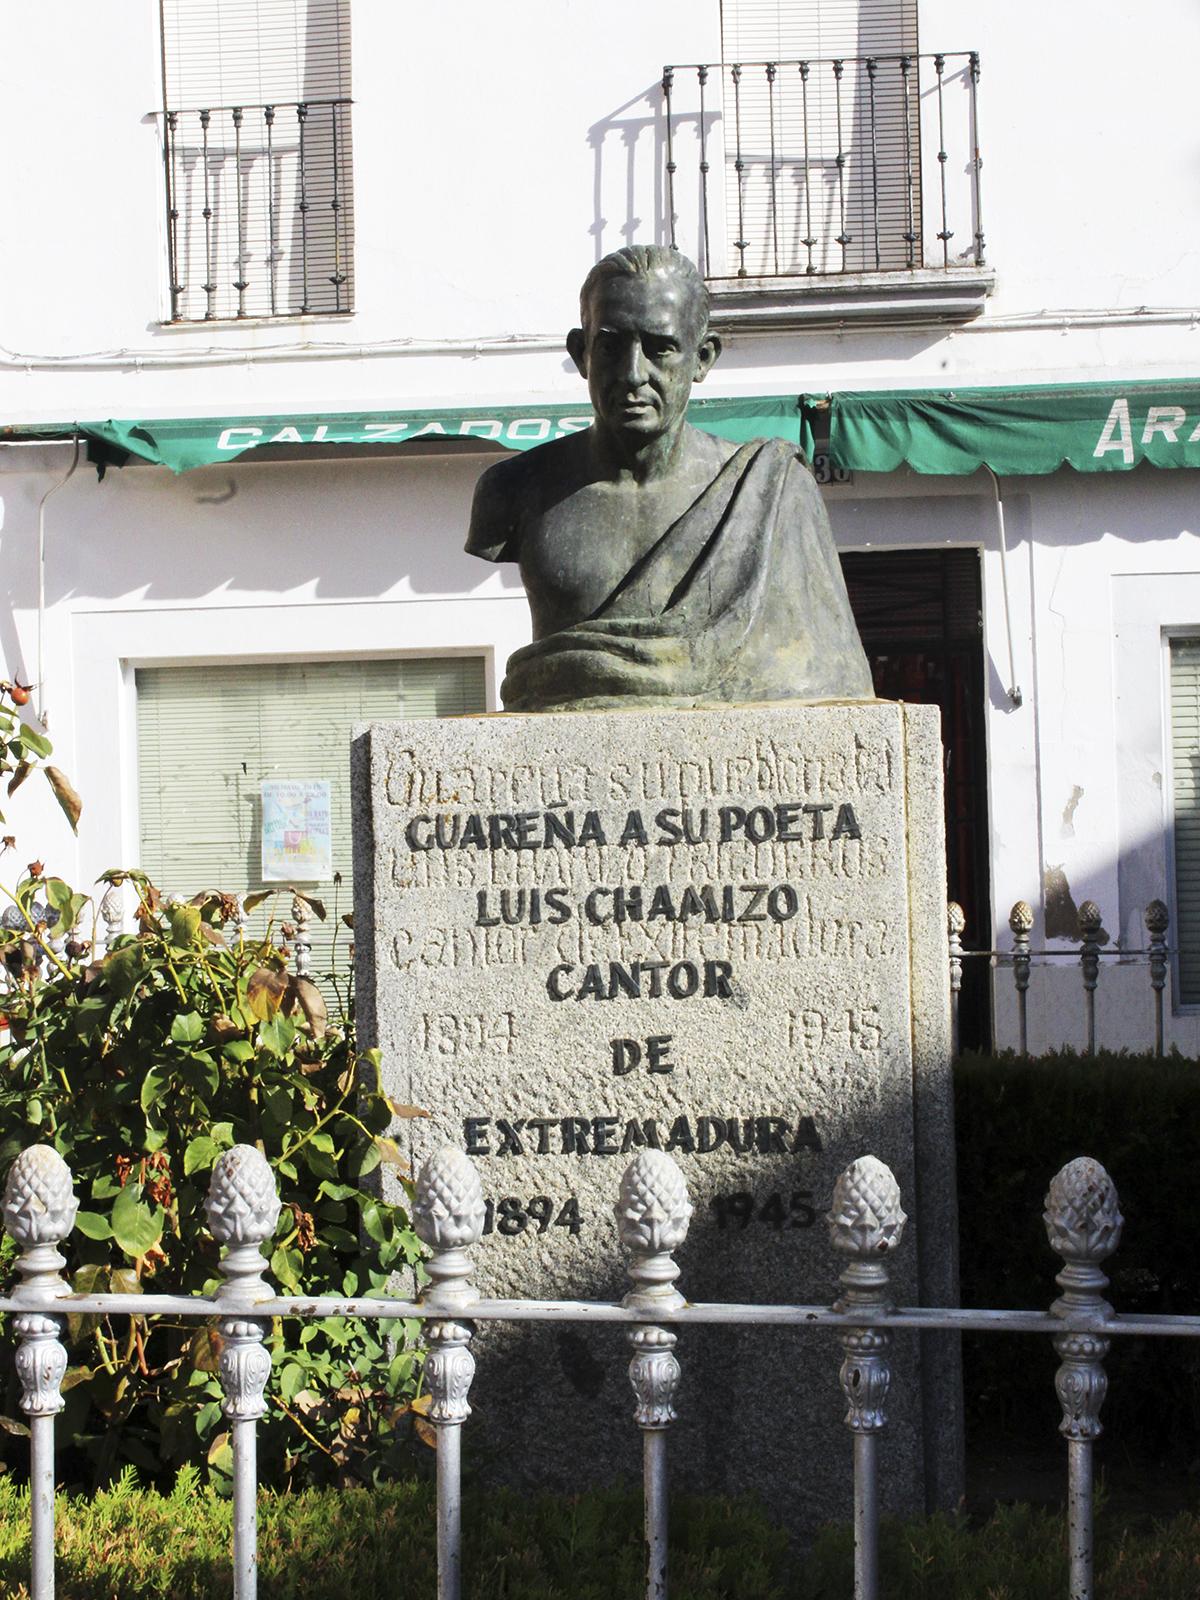 Busto de Luis Chamizo